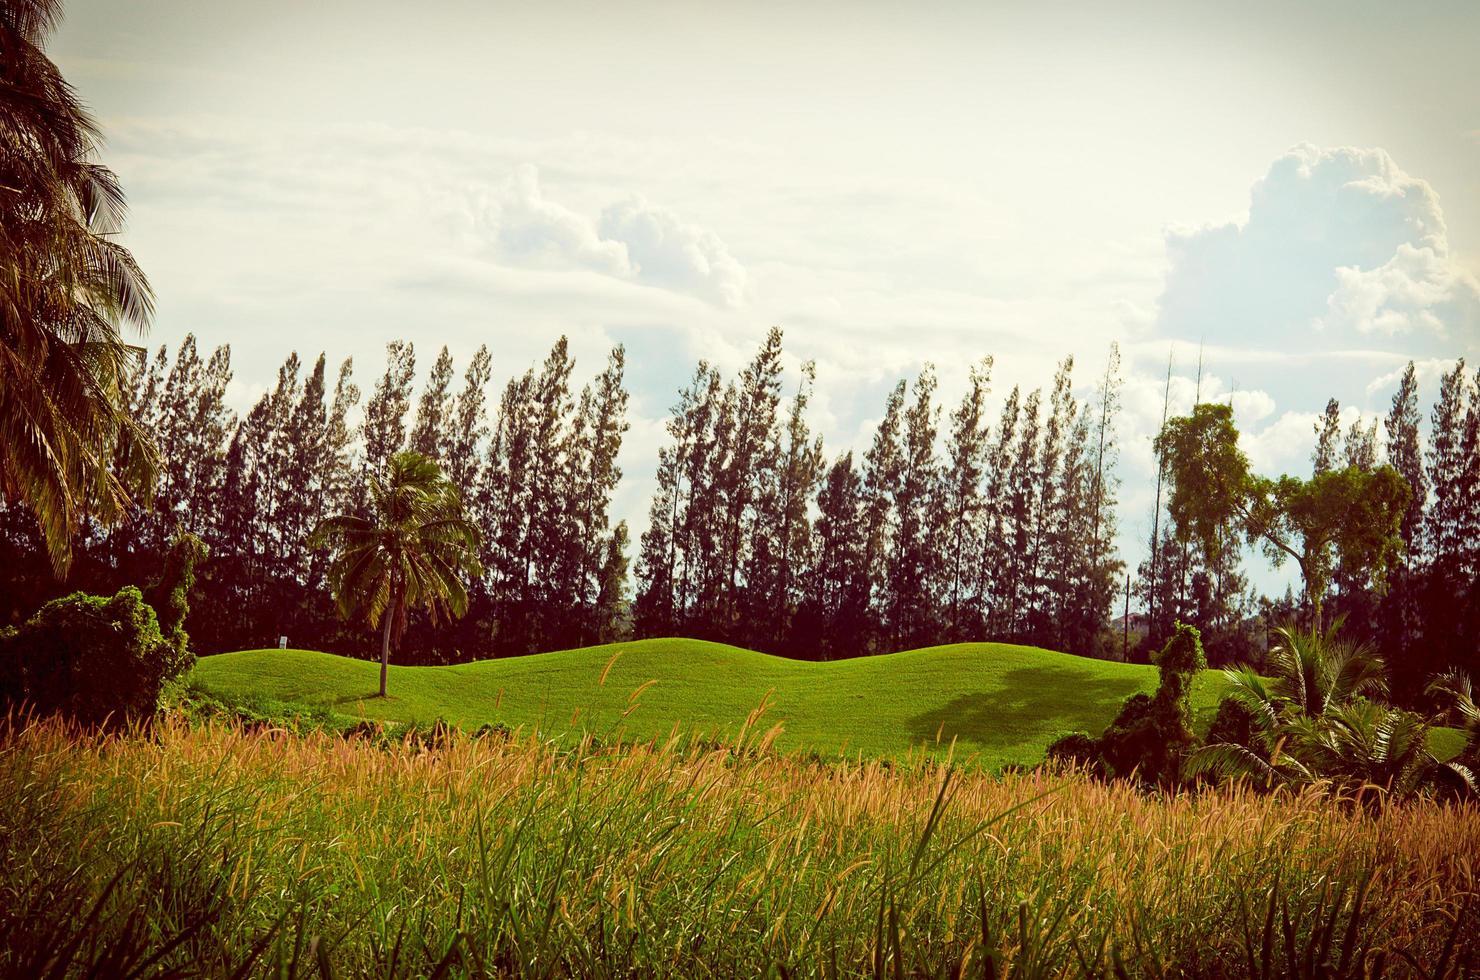 paisaje montañoso con filtro cálido foto